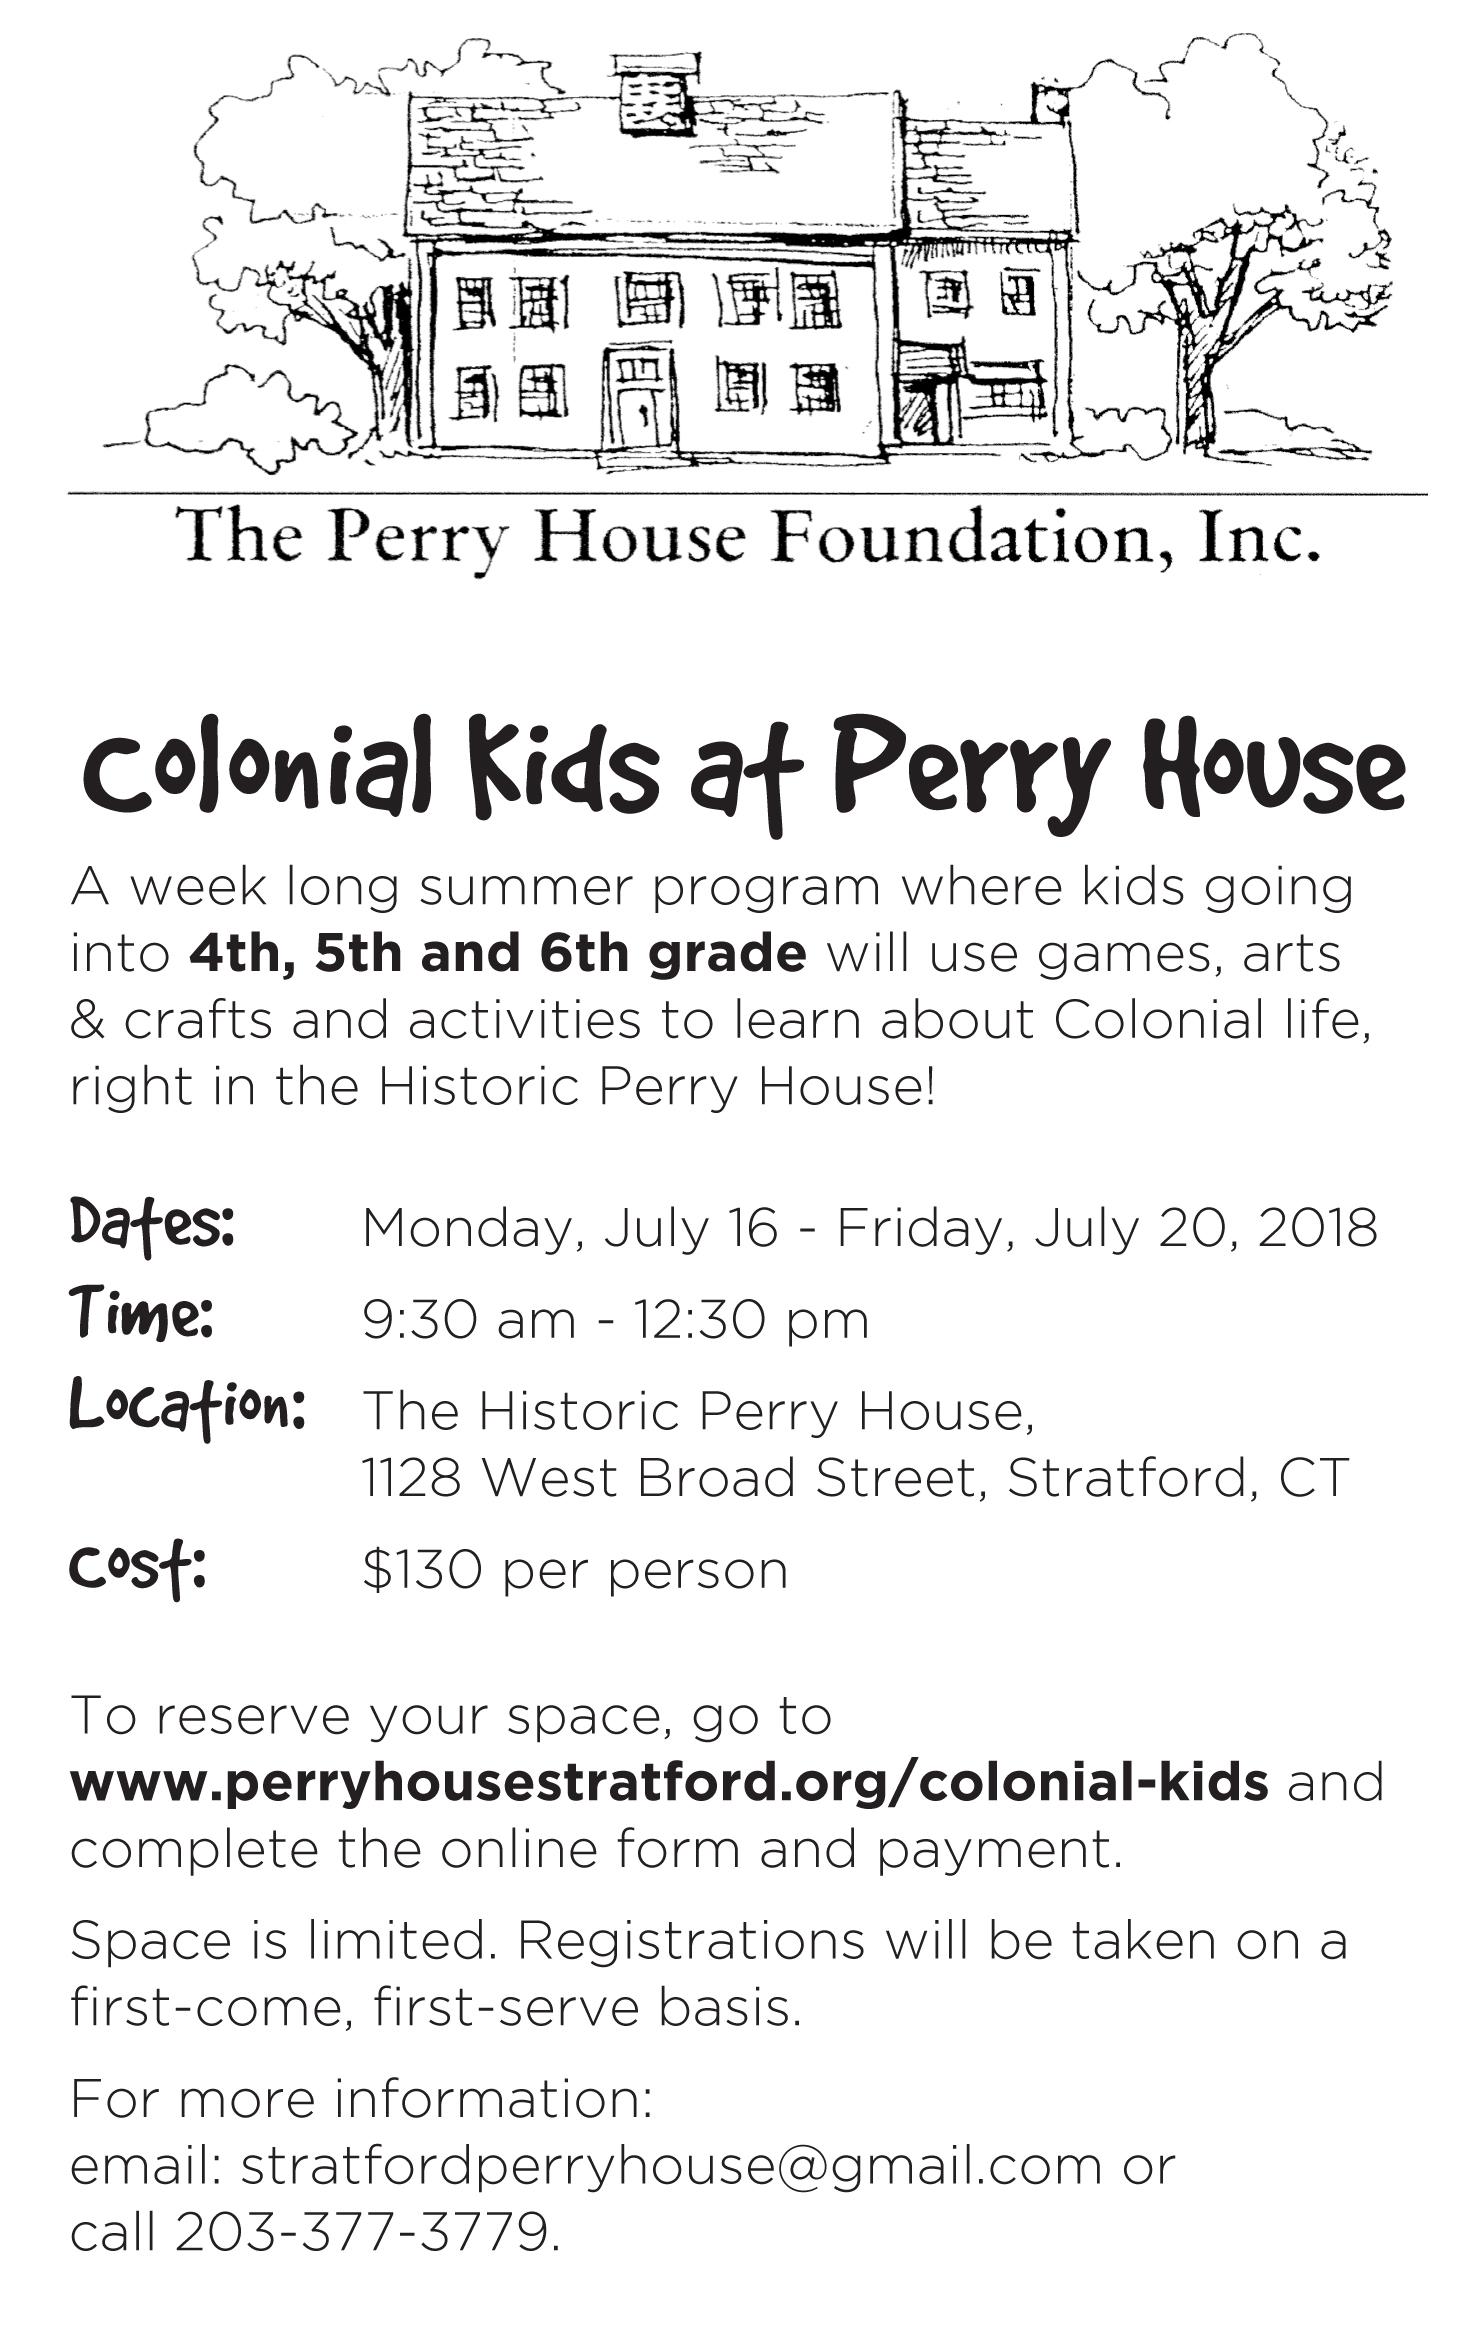 Colonial Kids Flyer.jpg